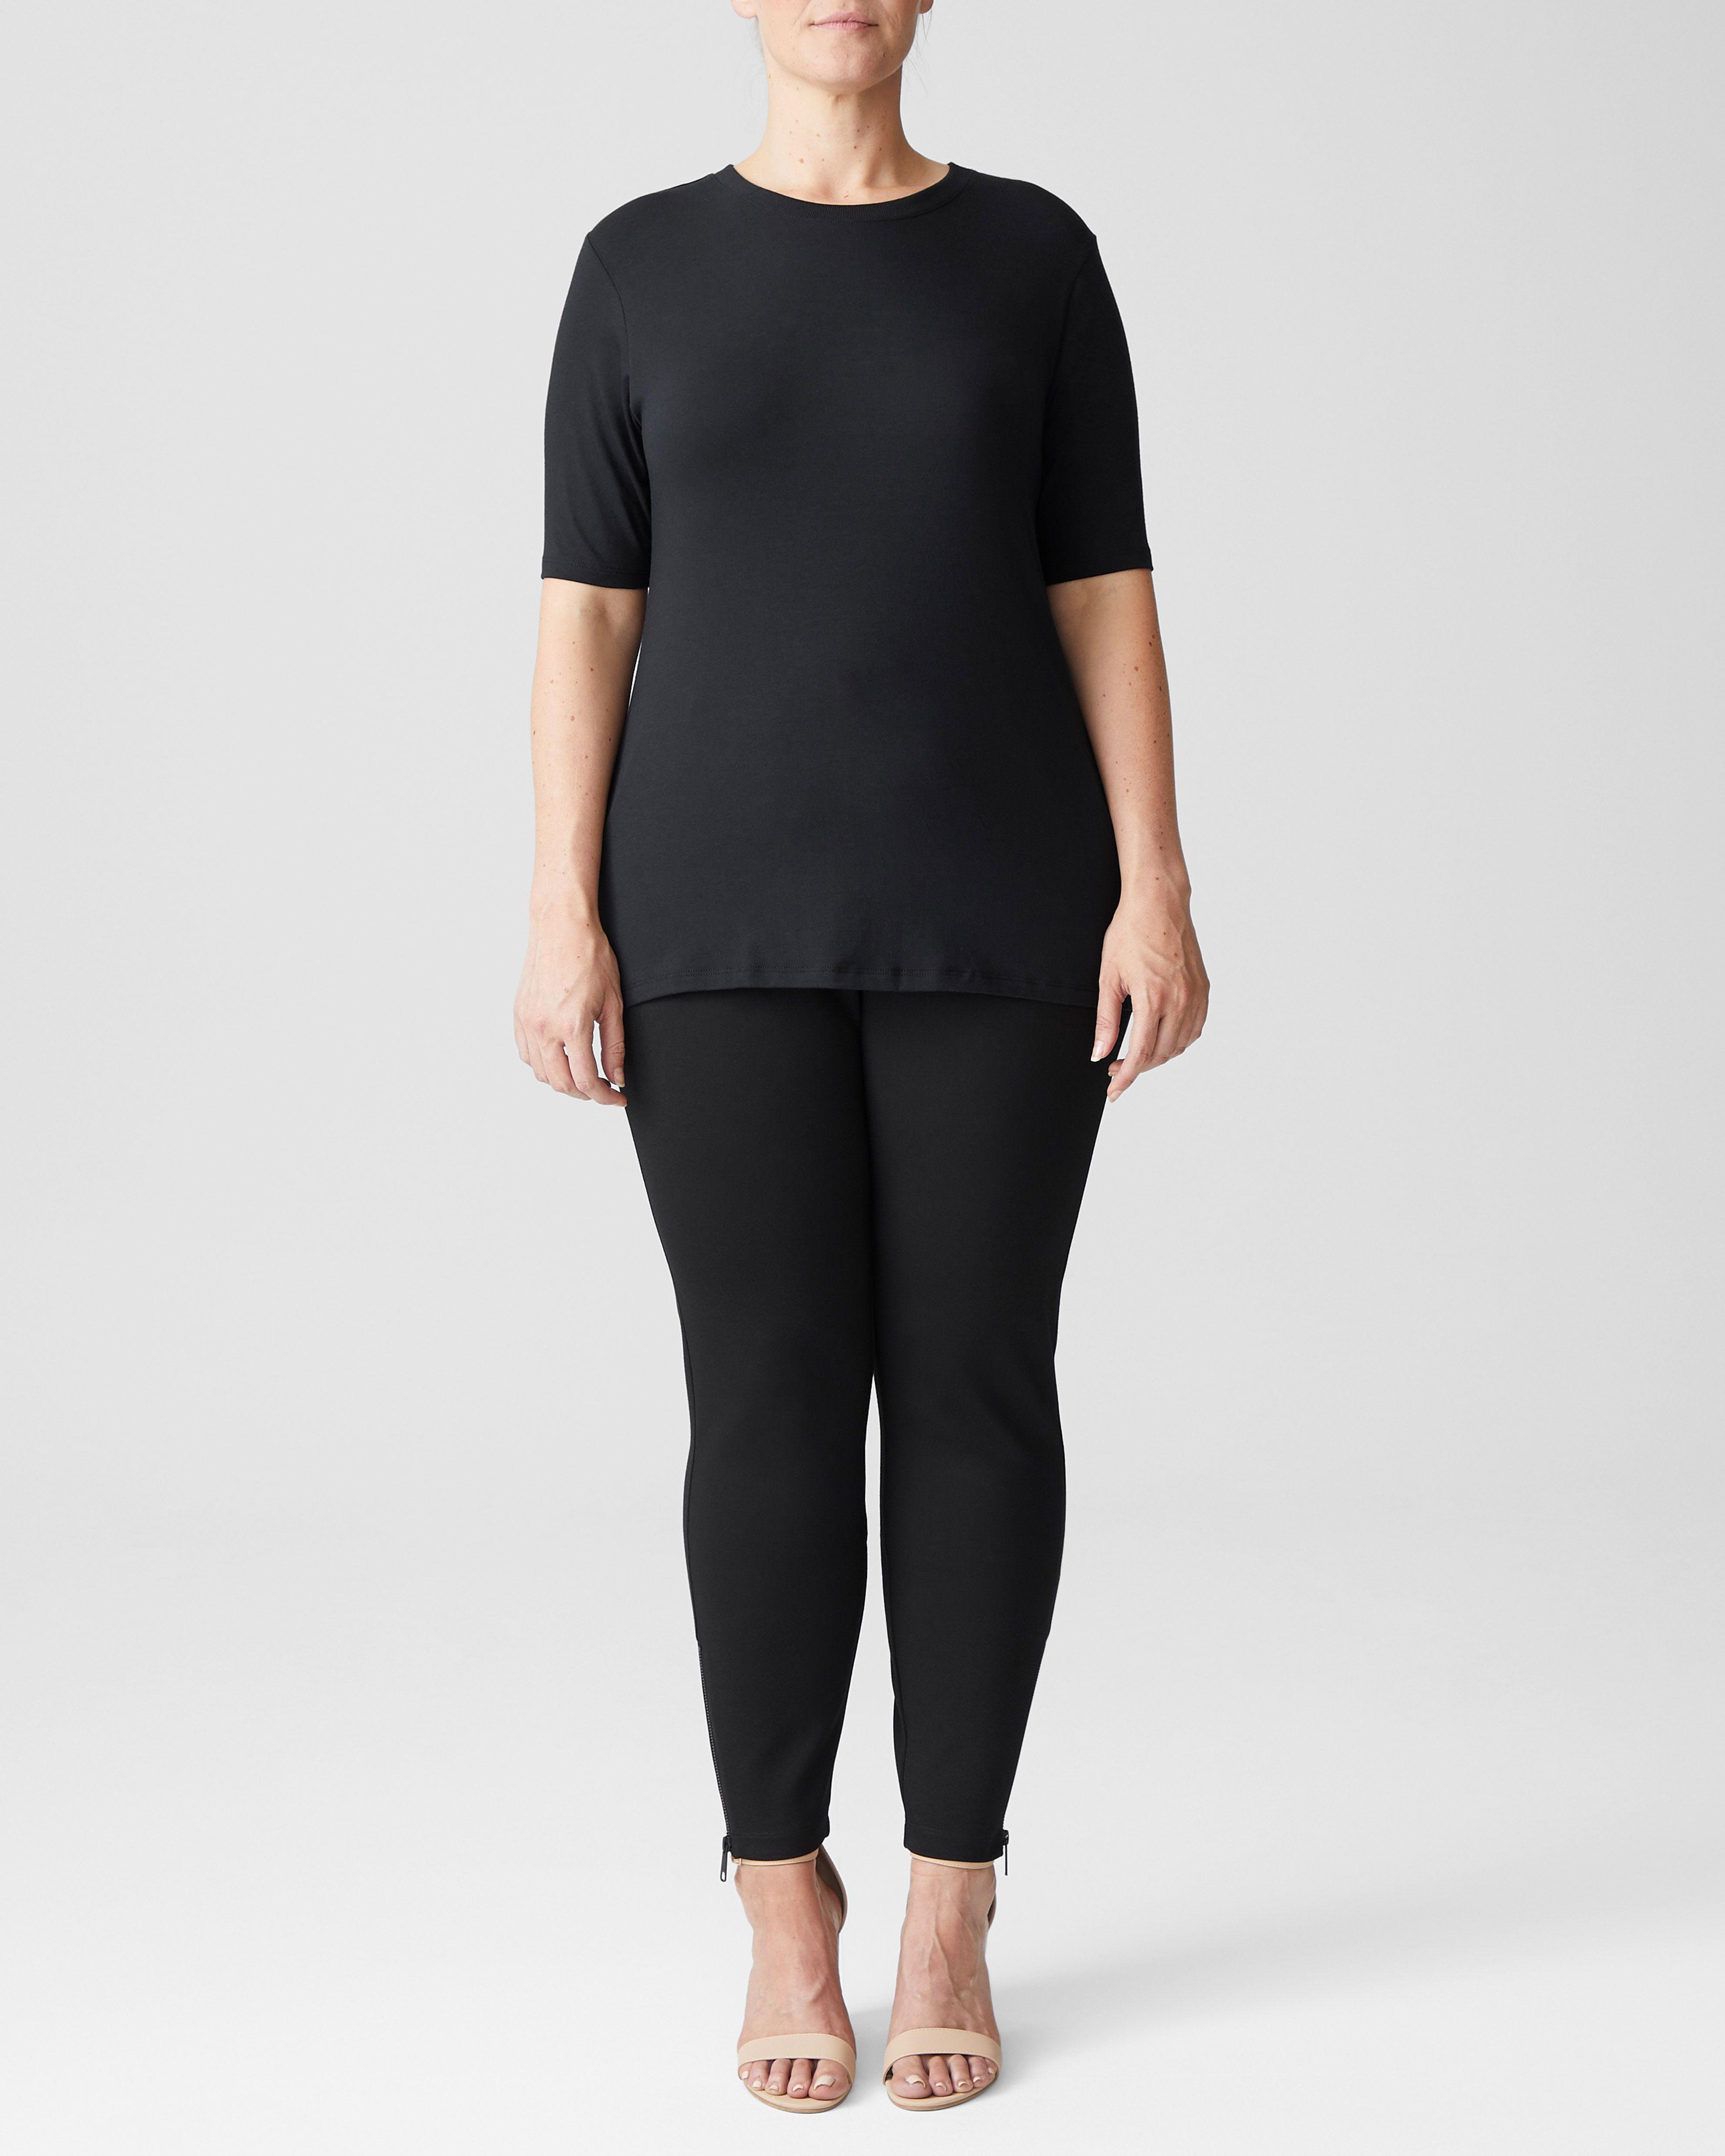 Maia Stovepipe Sleeve Tee - Black